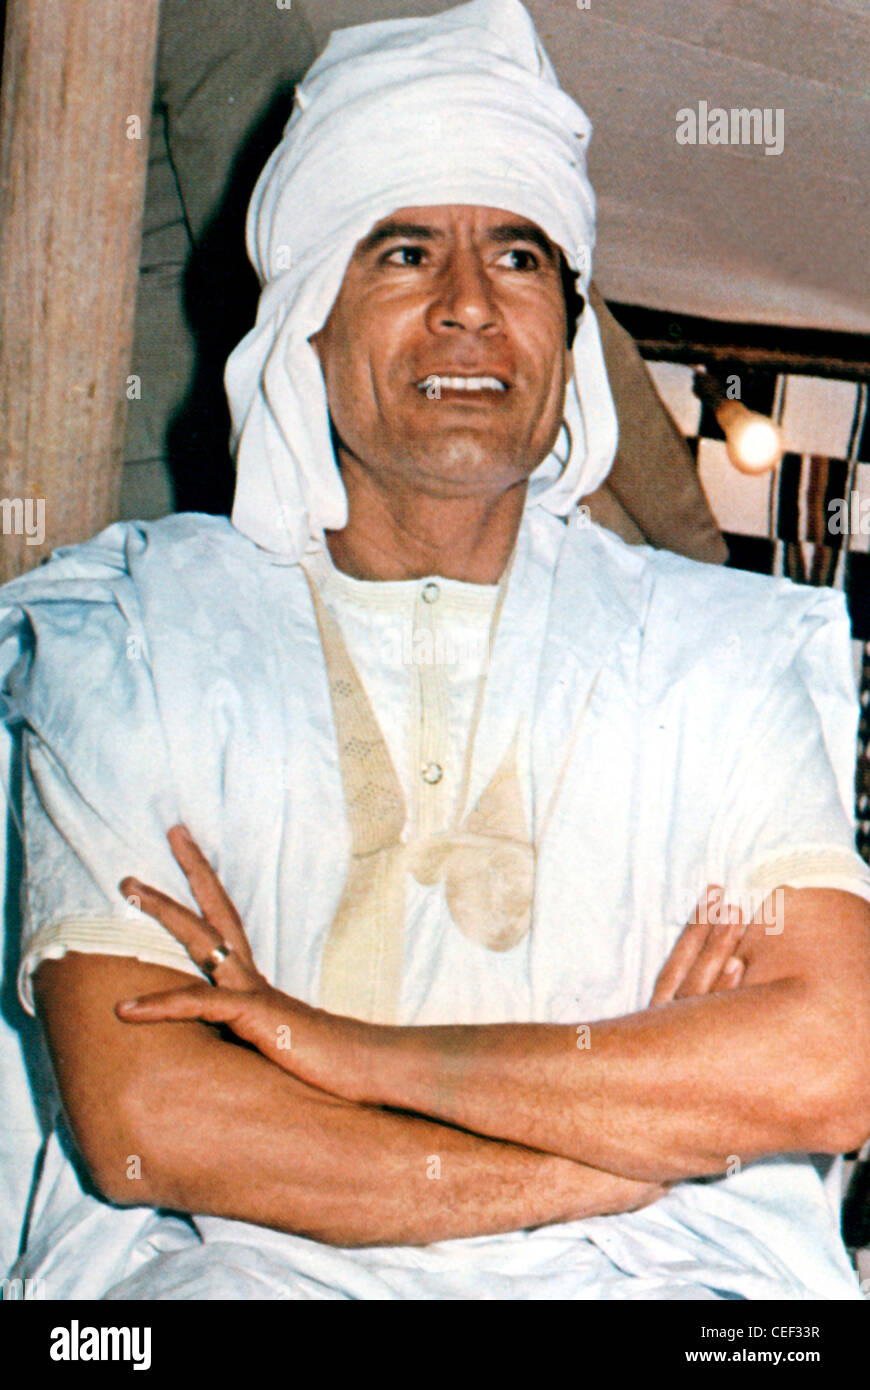 Propaganda poster of the Libyan leader Muammar al Gaddafi - *19.06.1942 - 20.10.2011. - Stock Image